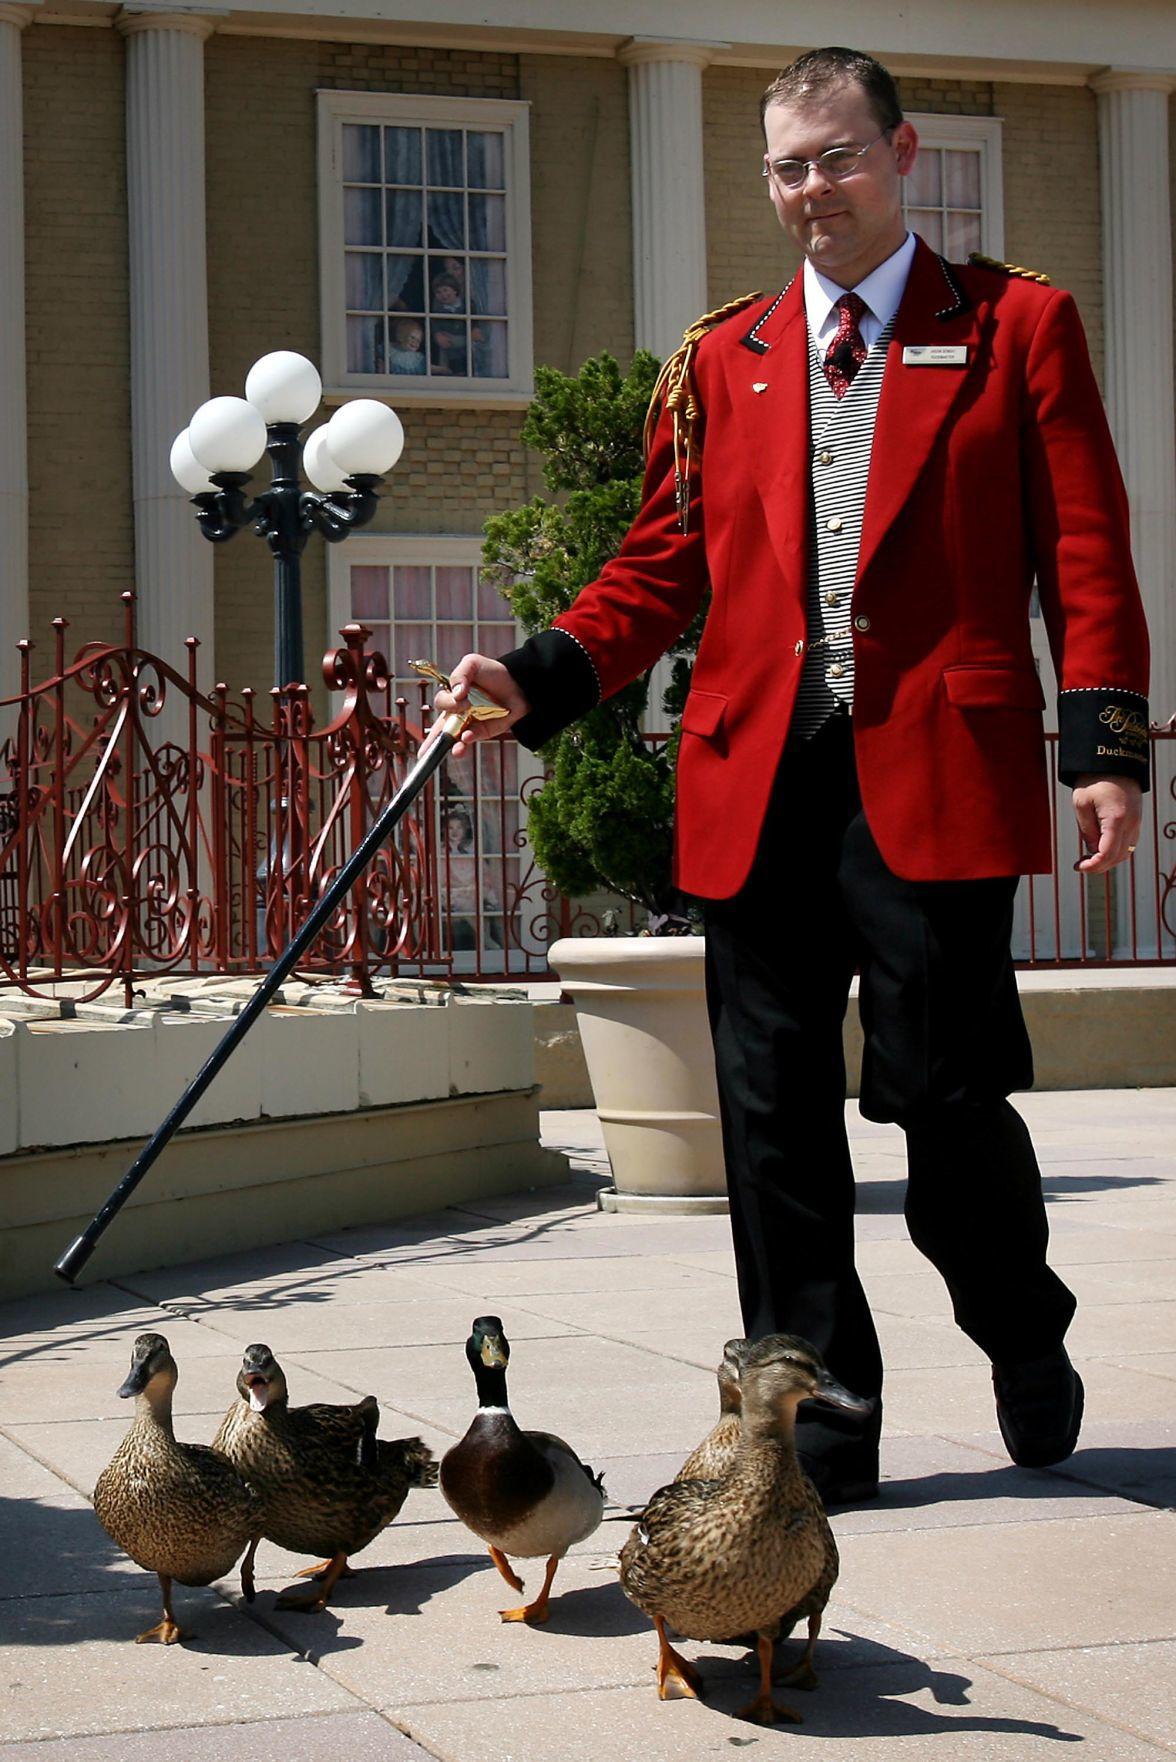 New Duckmaster